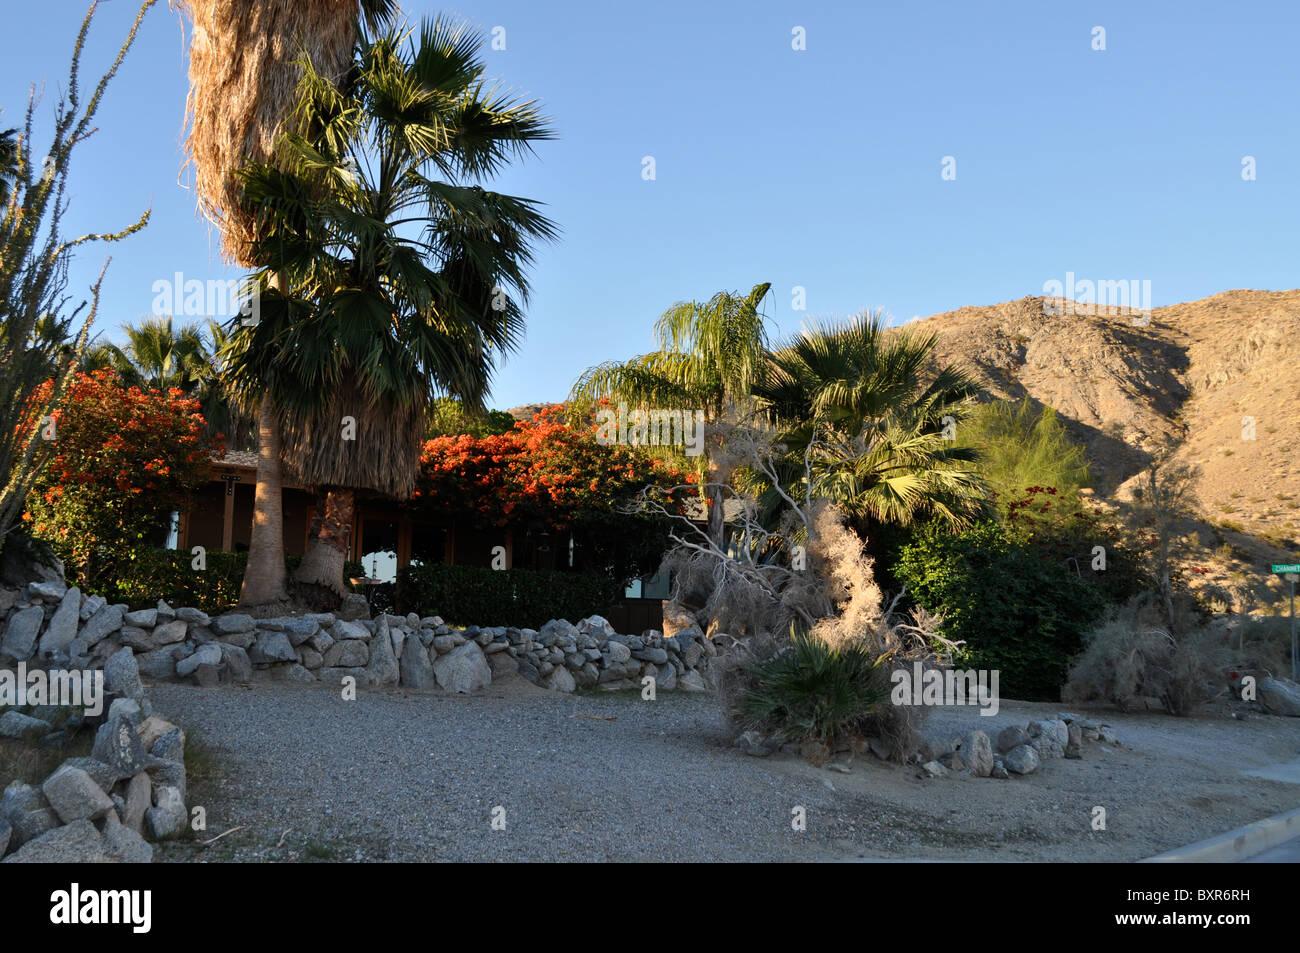 Palm Springs risalente incontri Pune Kothrud